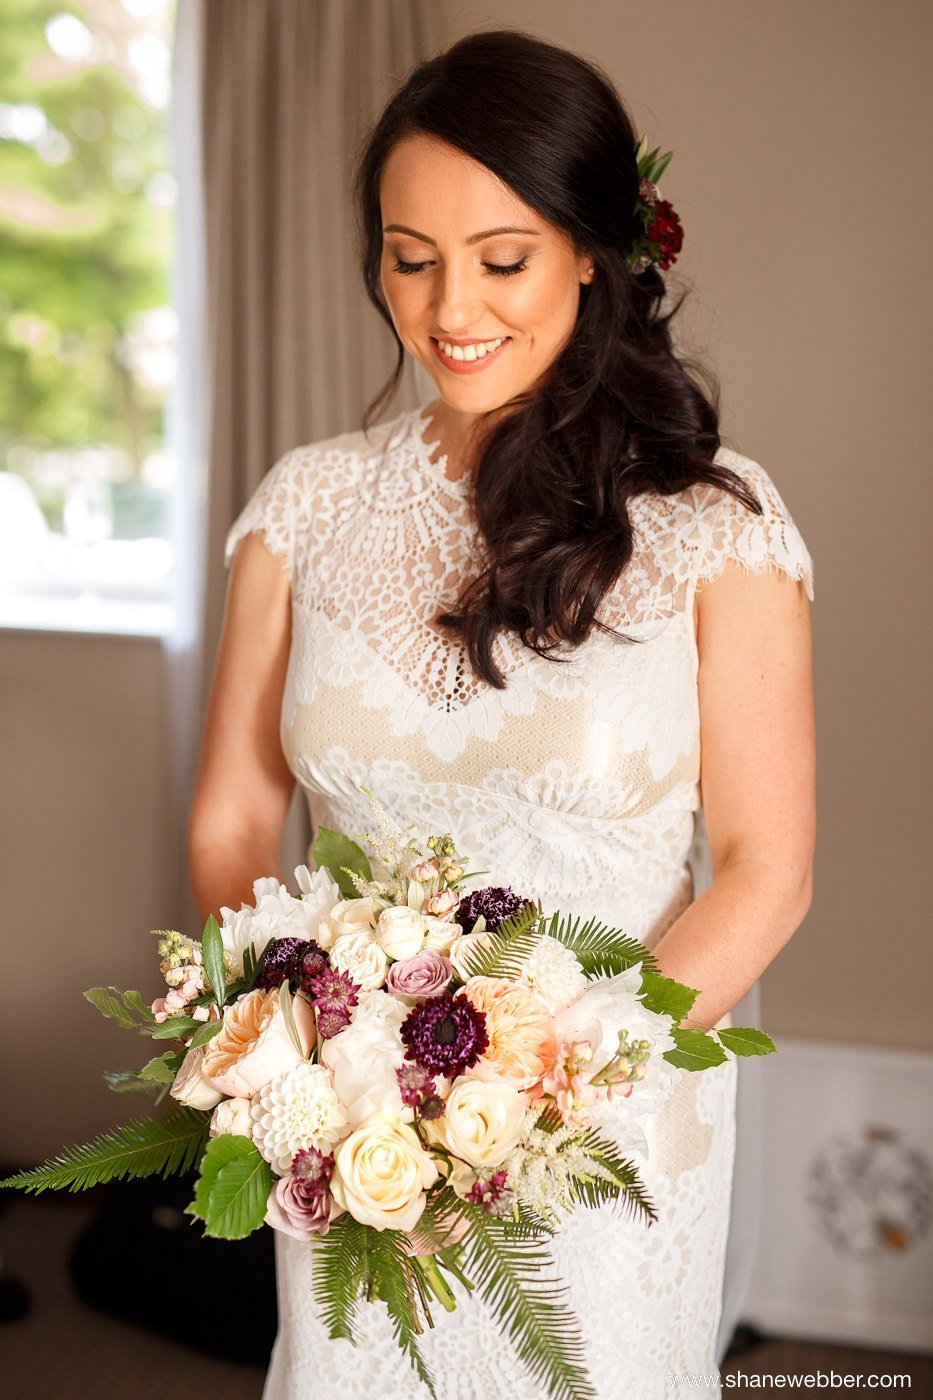 Merrydale Manor bridal preparation photo